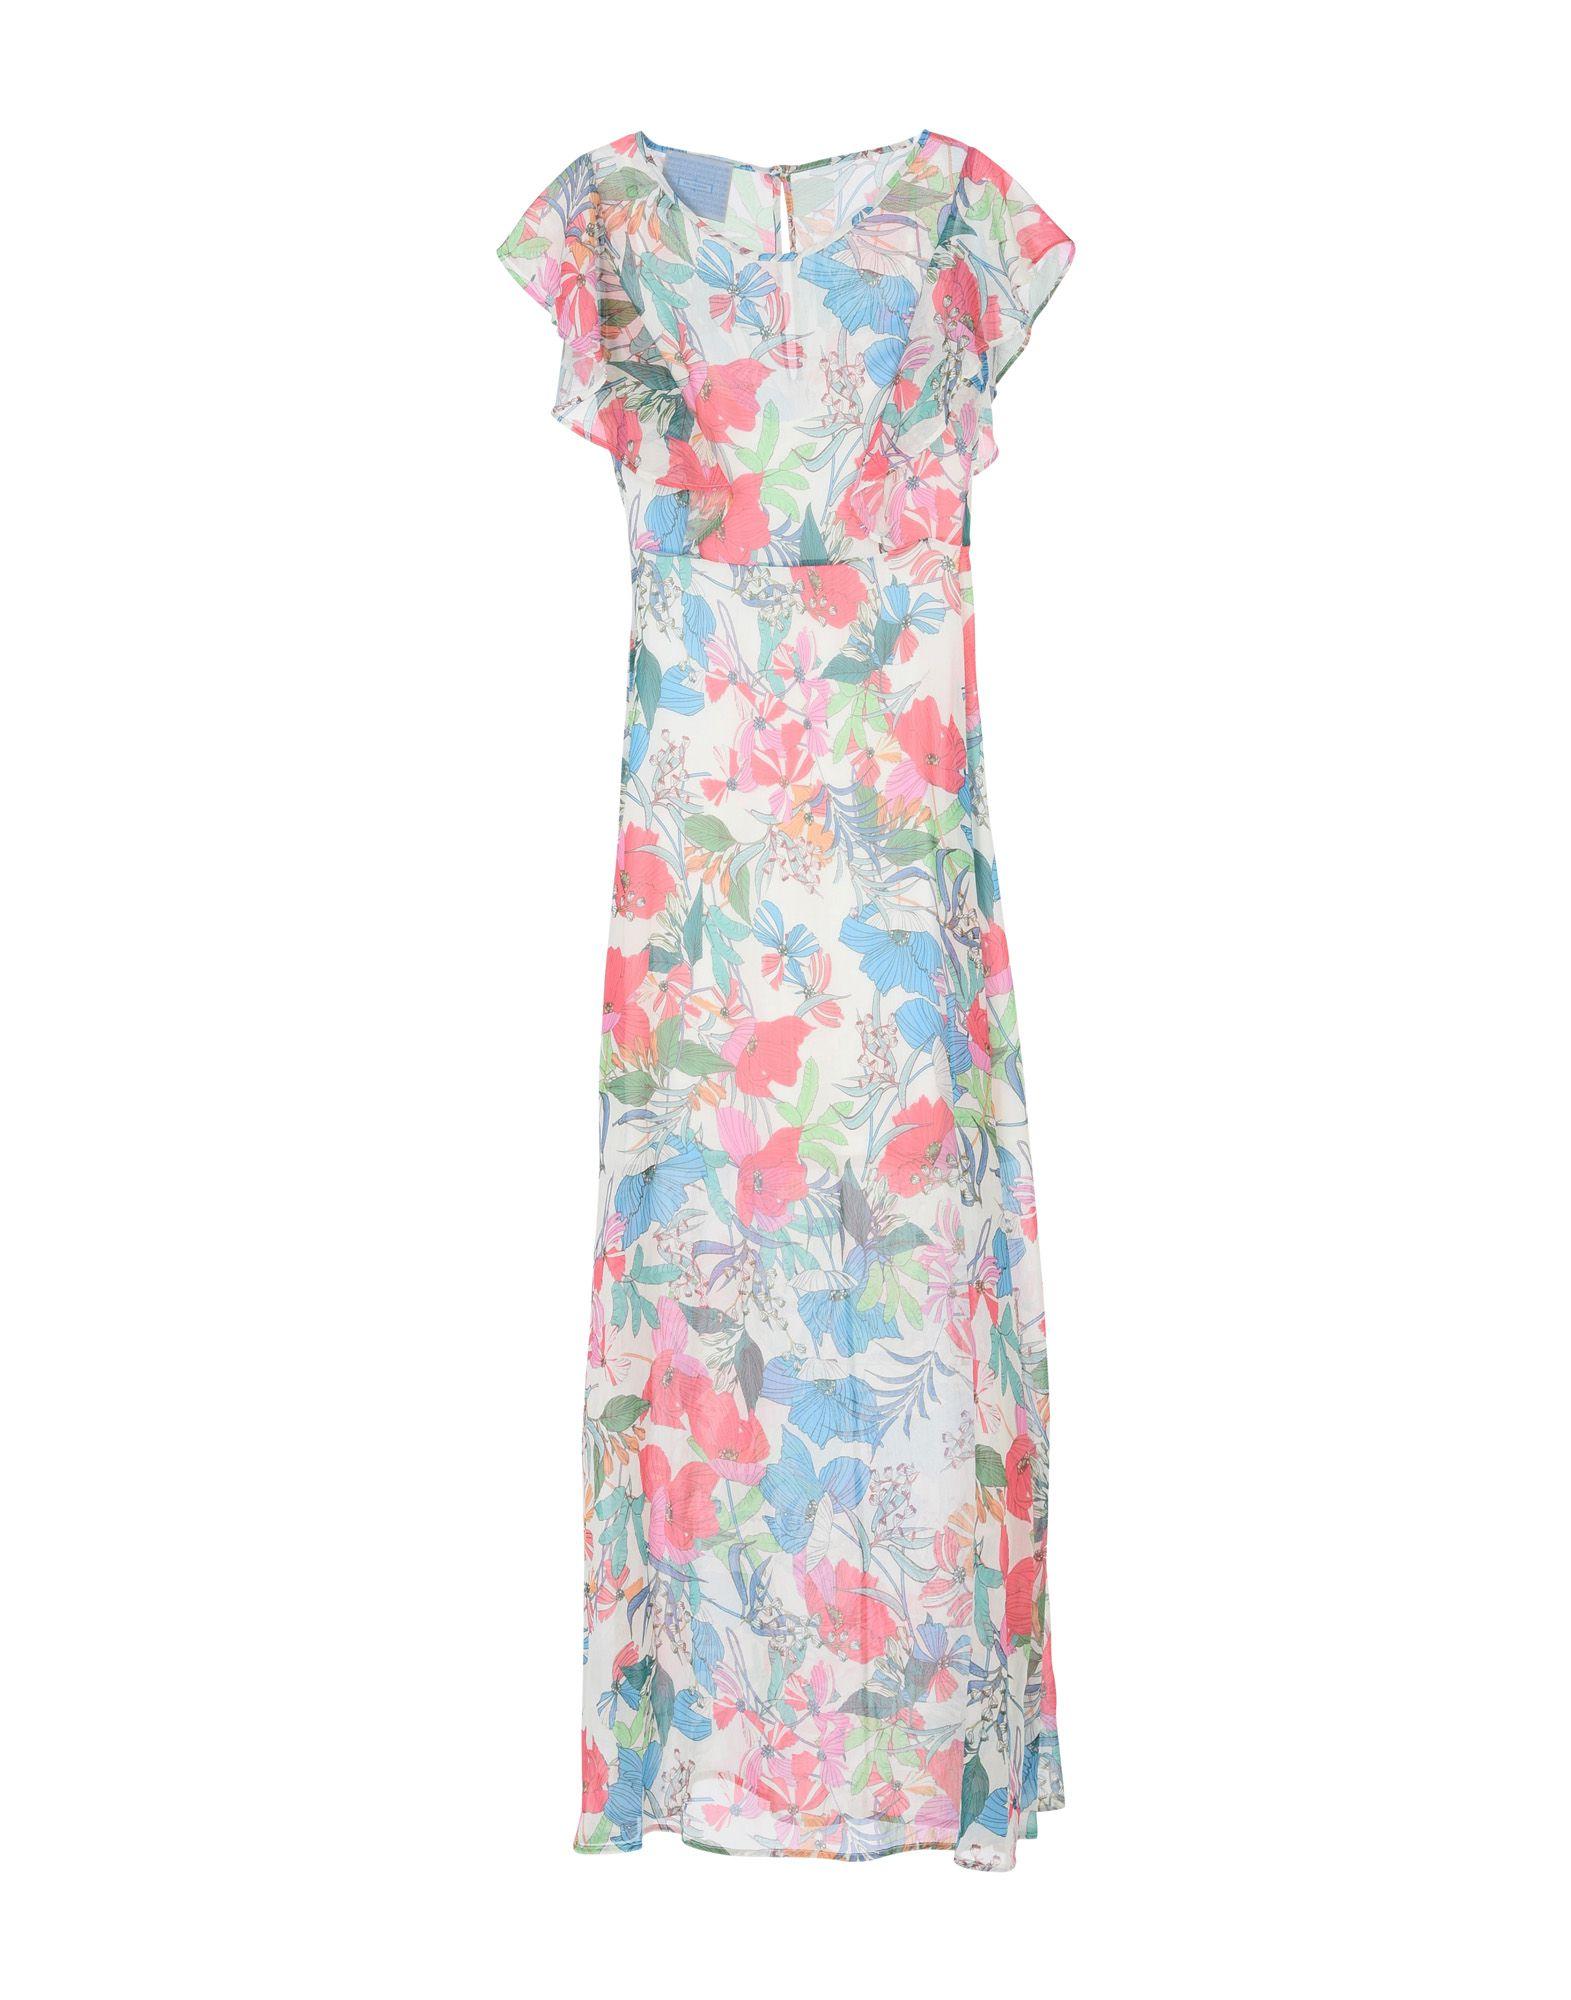 MIA SULIMAN Длинное платье mia mia комбинация амаранта